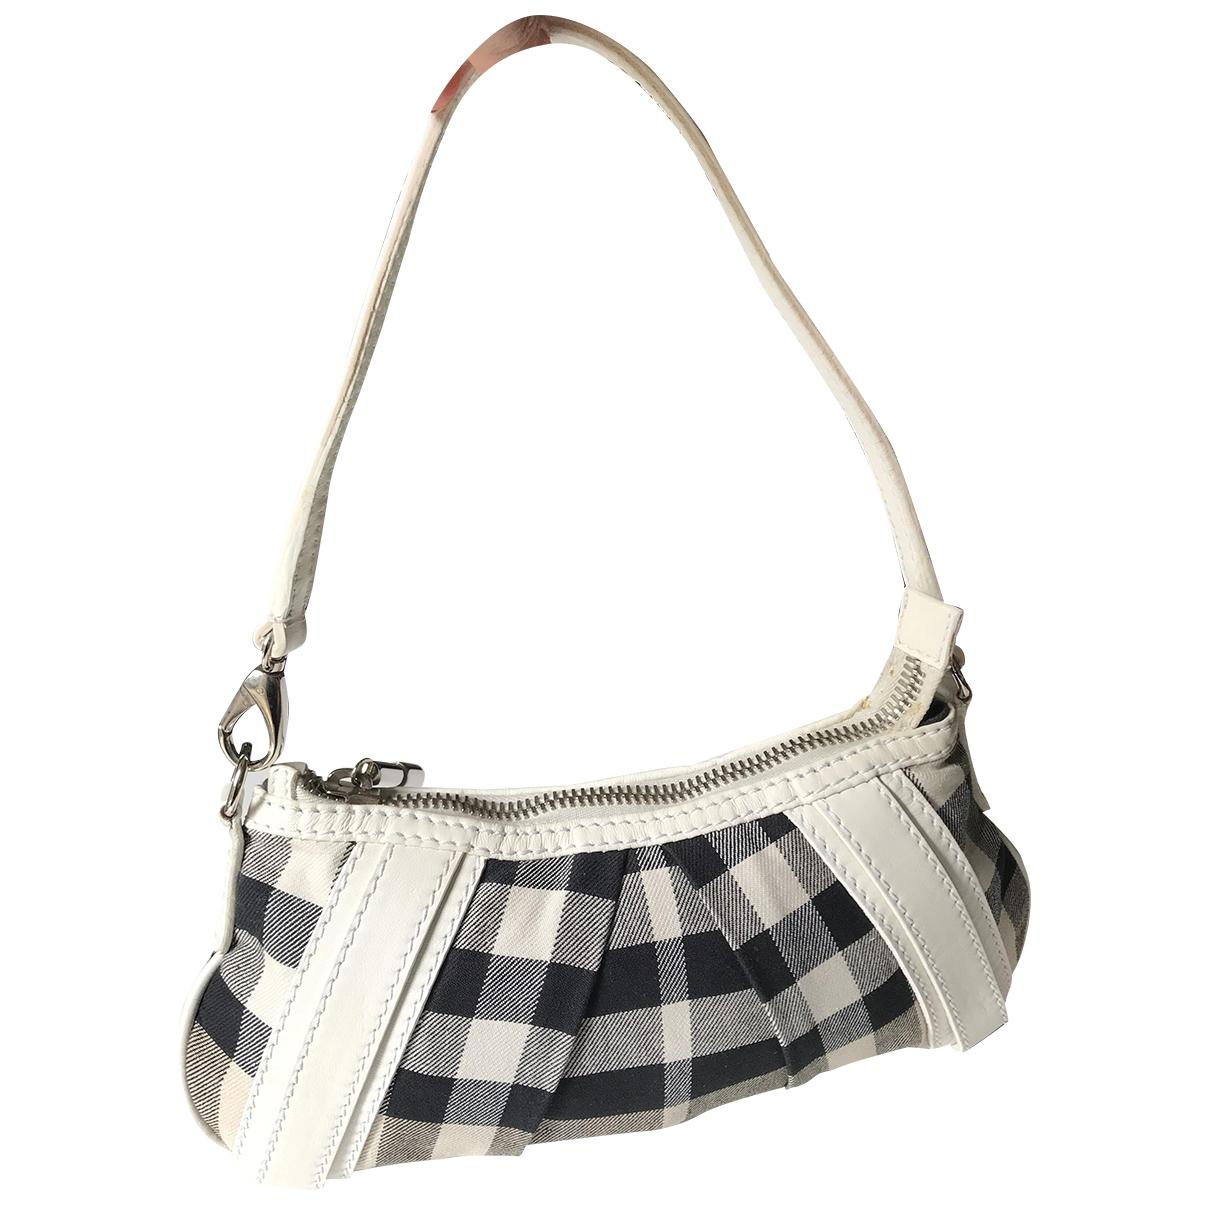 Burberry \N Handtasche in  Ecru Baumwolle